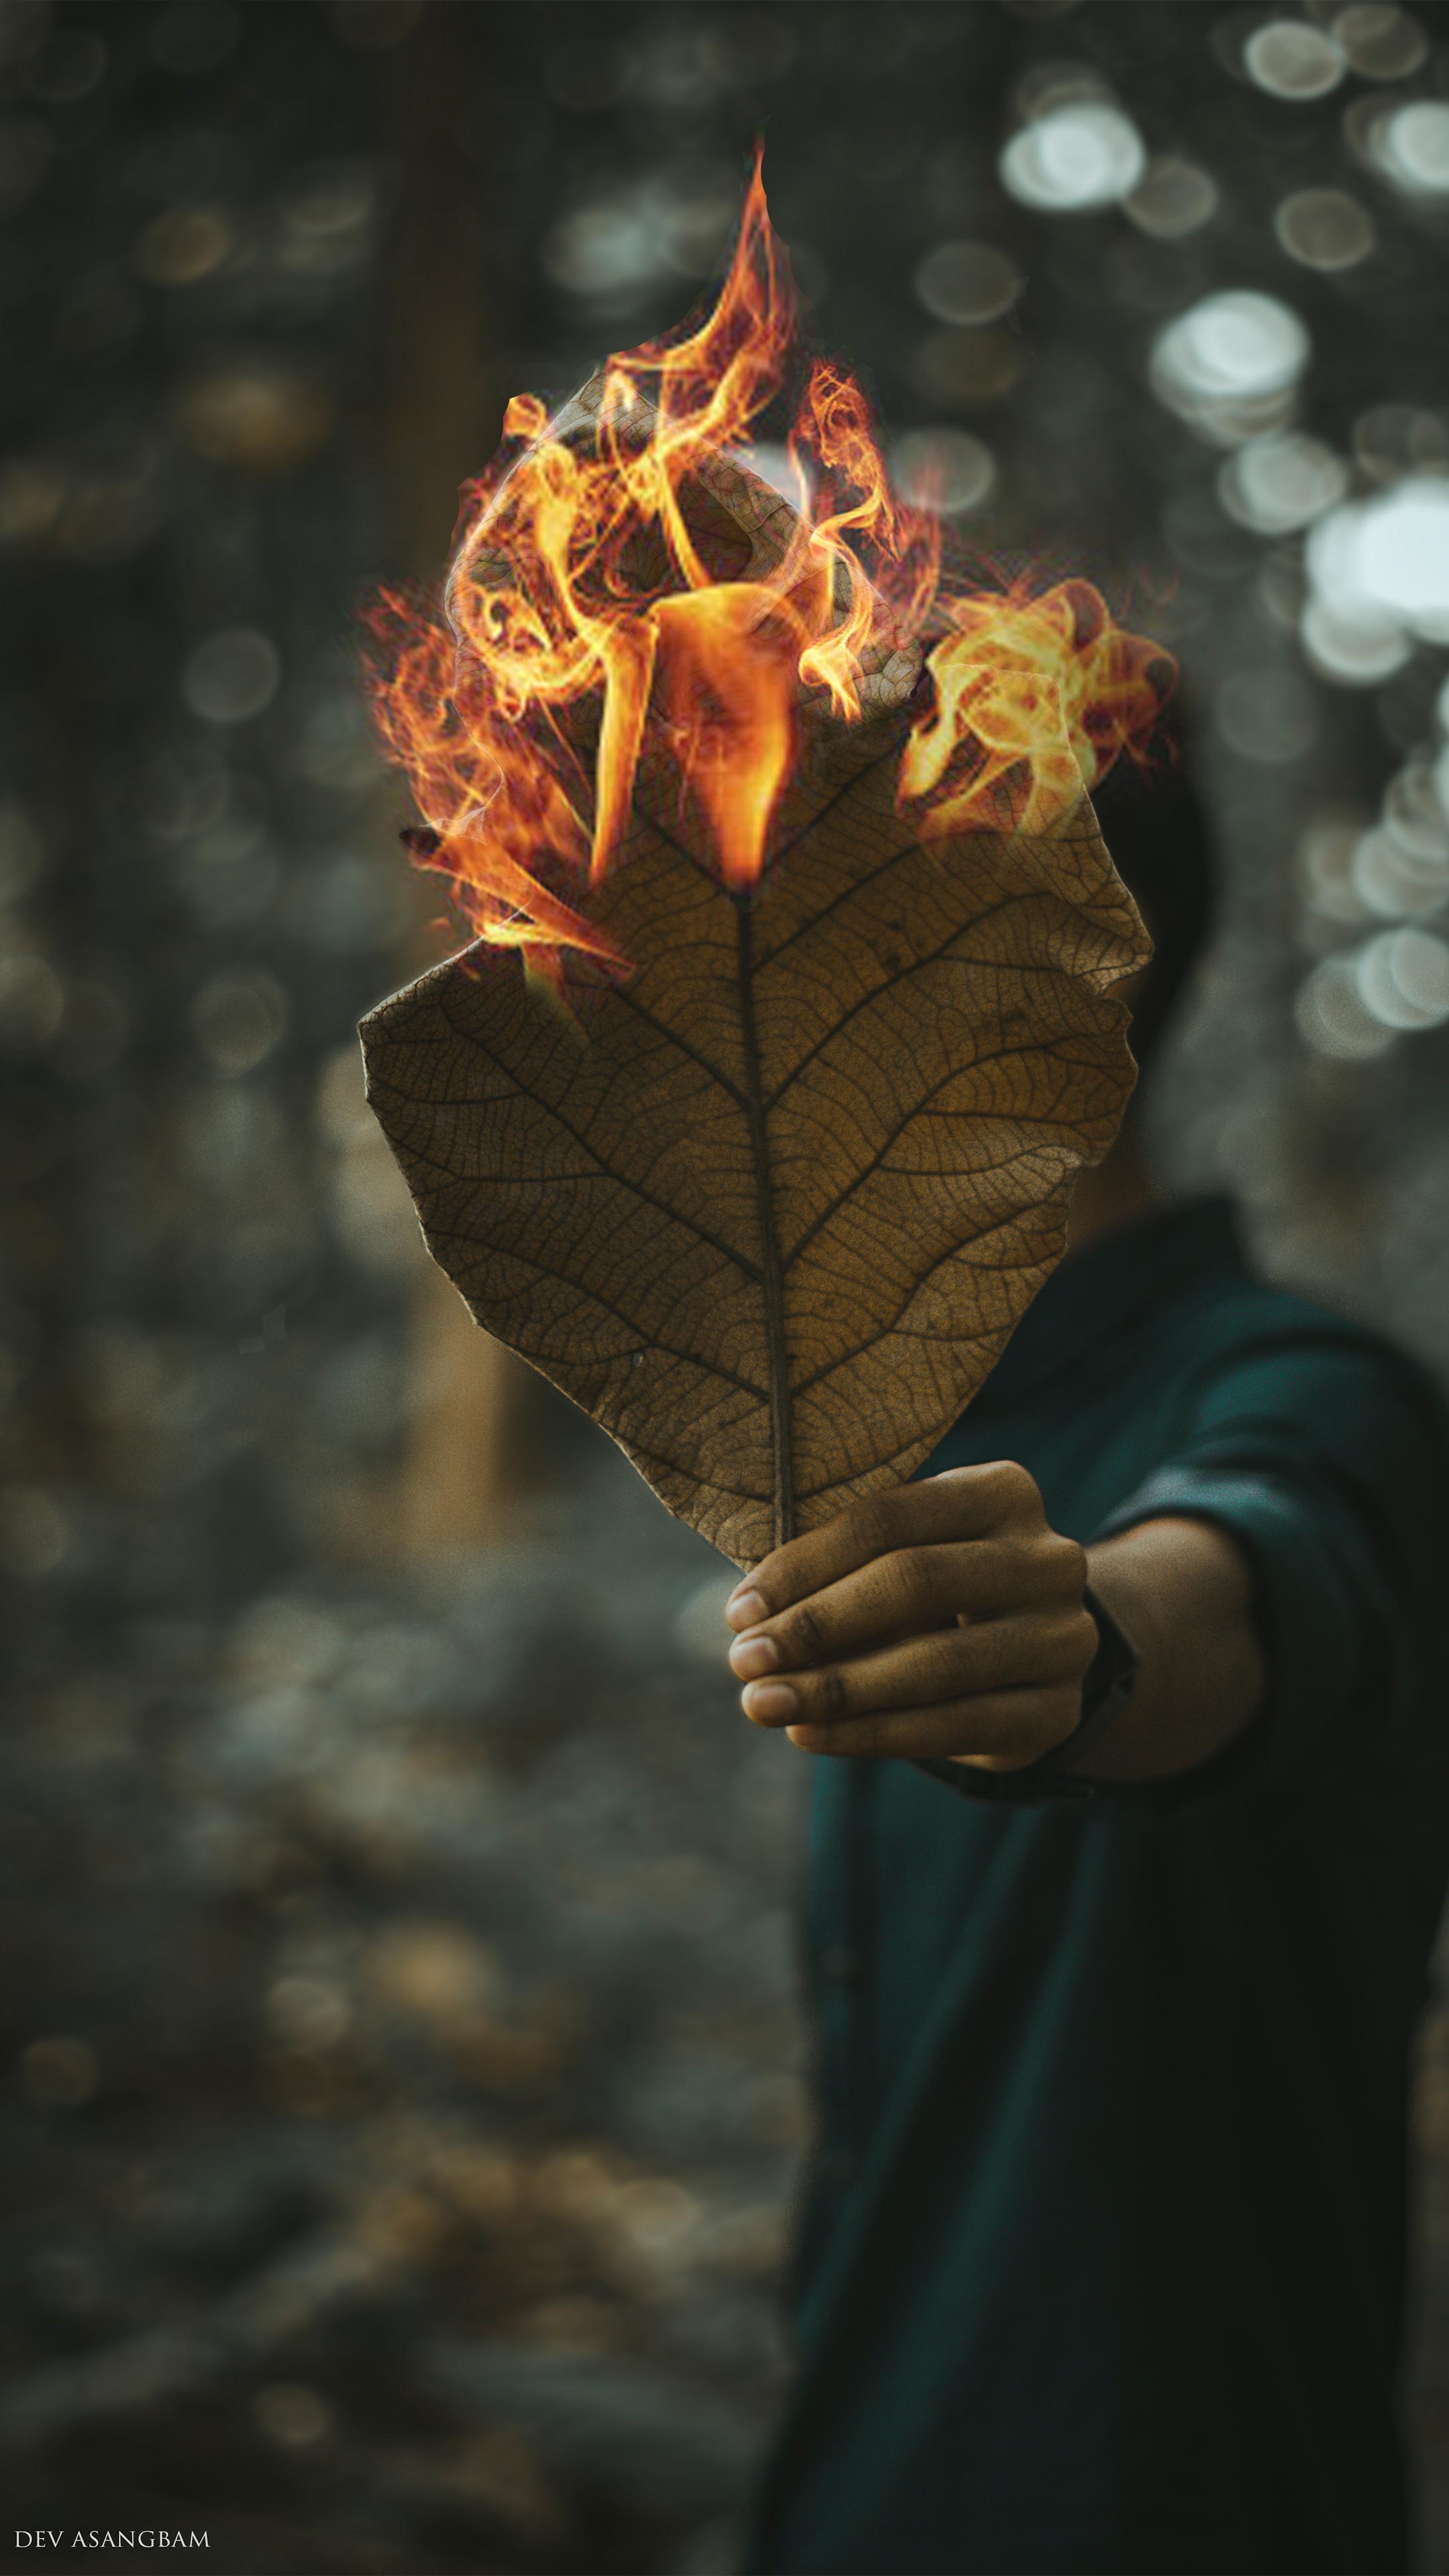 Man Leaves Fire Photography 4K Ultra HD Mobile Wallpaper